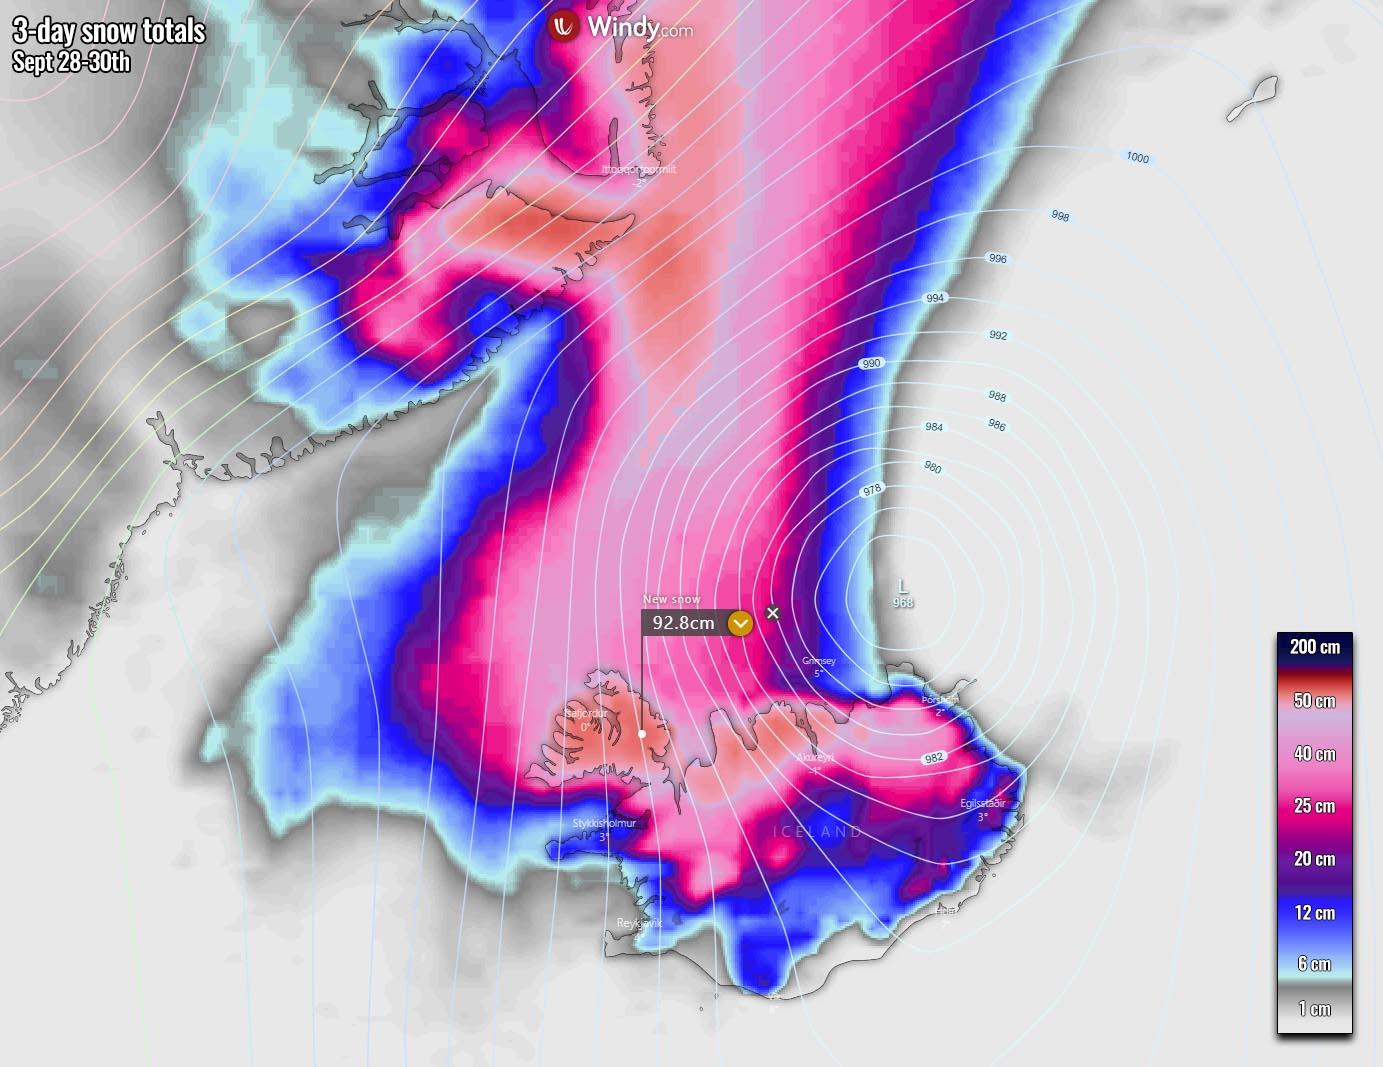 north-atlantic-cold-pool-uk-ireland-snow-iceland-blizzard